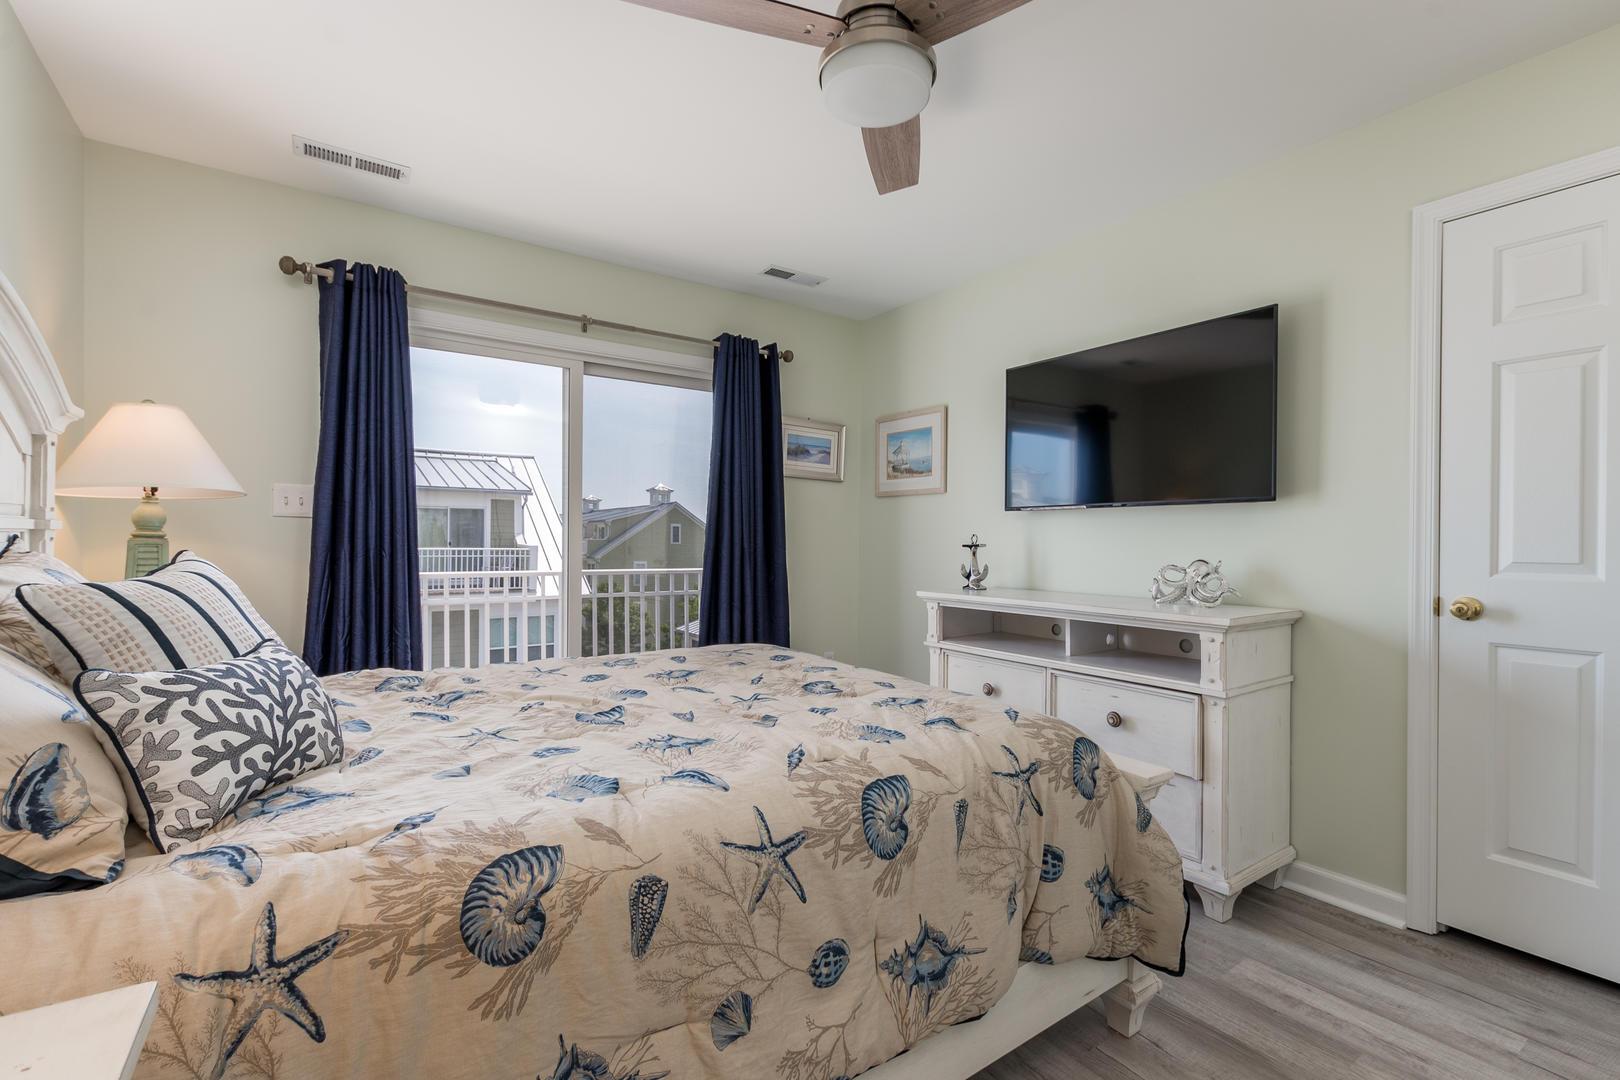 Sunset Island, 33 Sunset Island Drive - Top Floor Bedroom